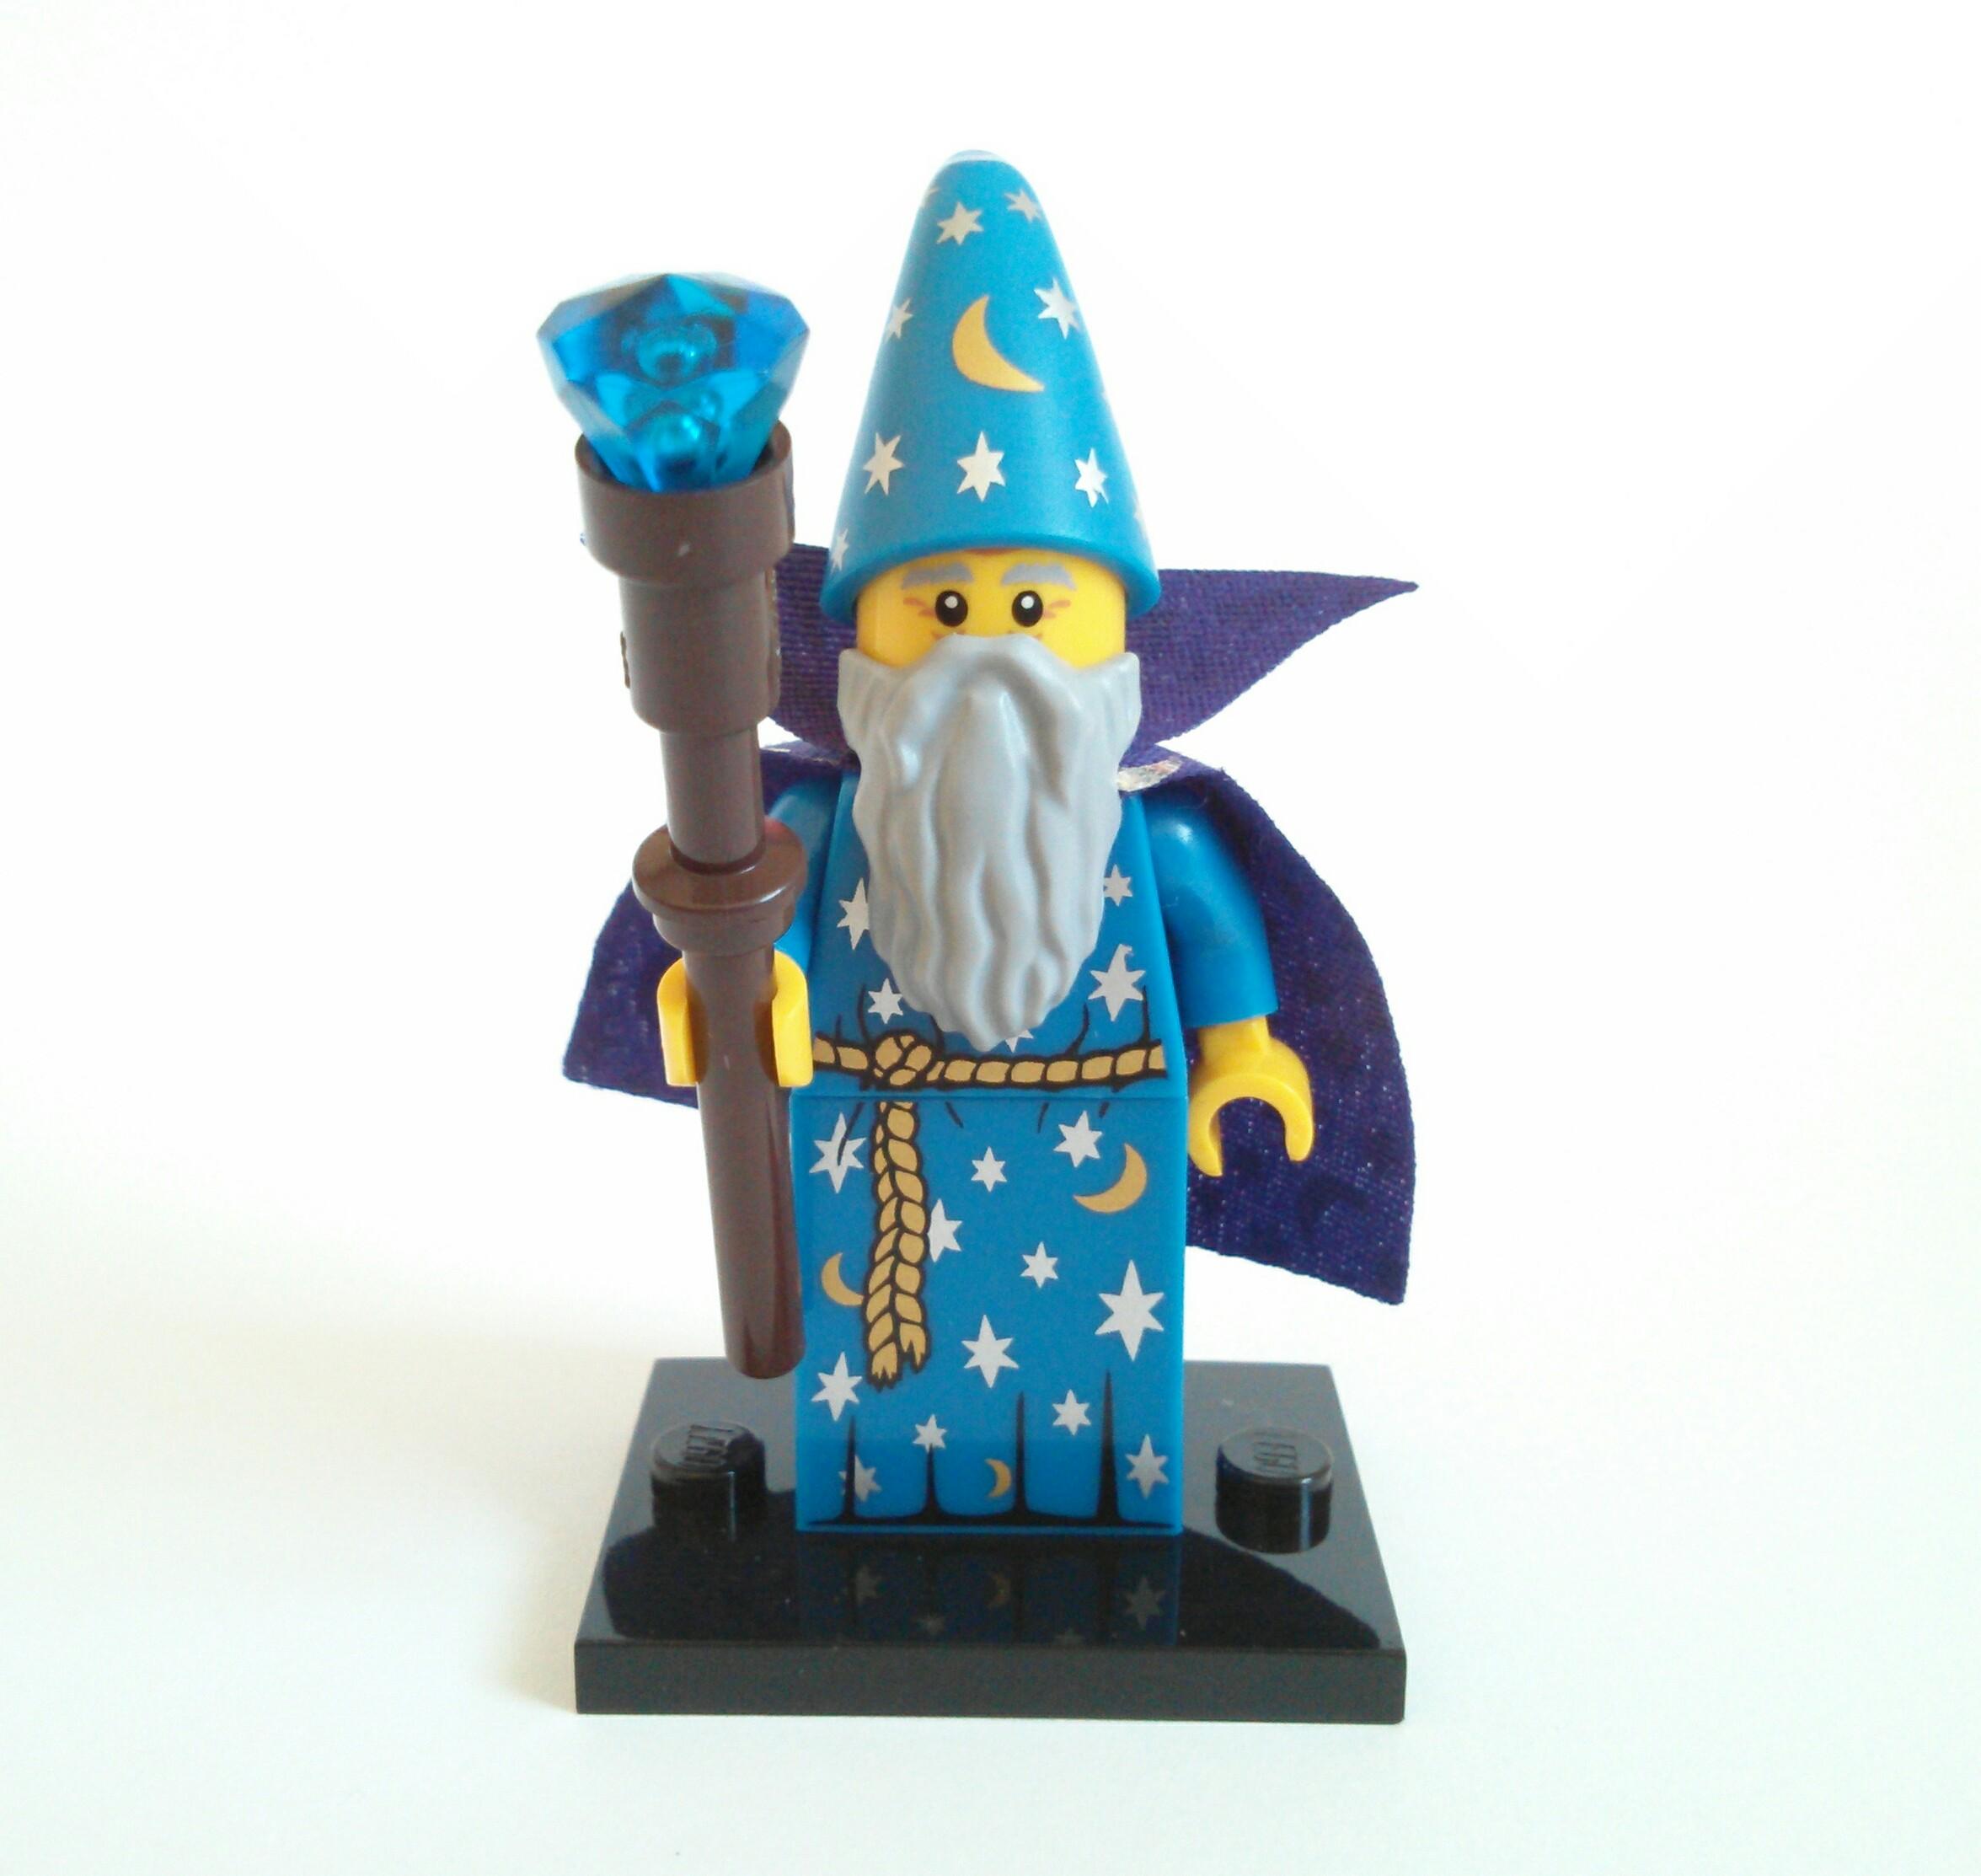 LEGO Series 12 Collectible Minifigure 71007 Wizard